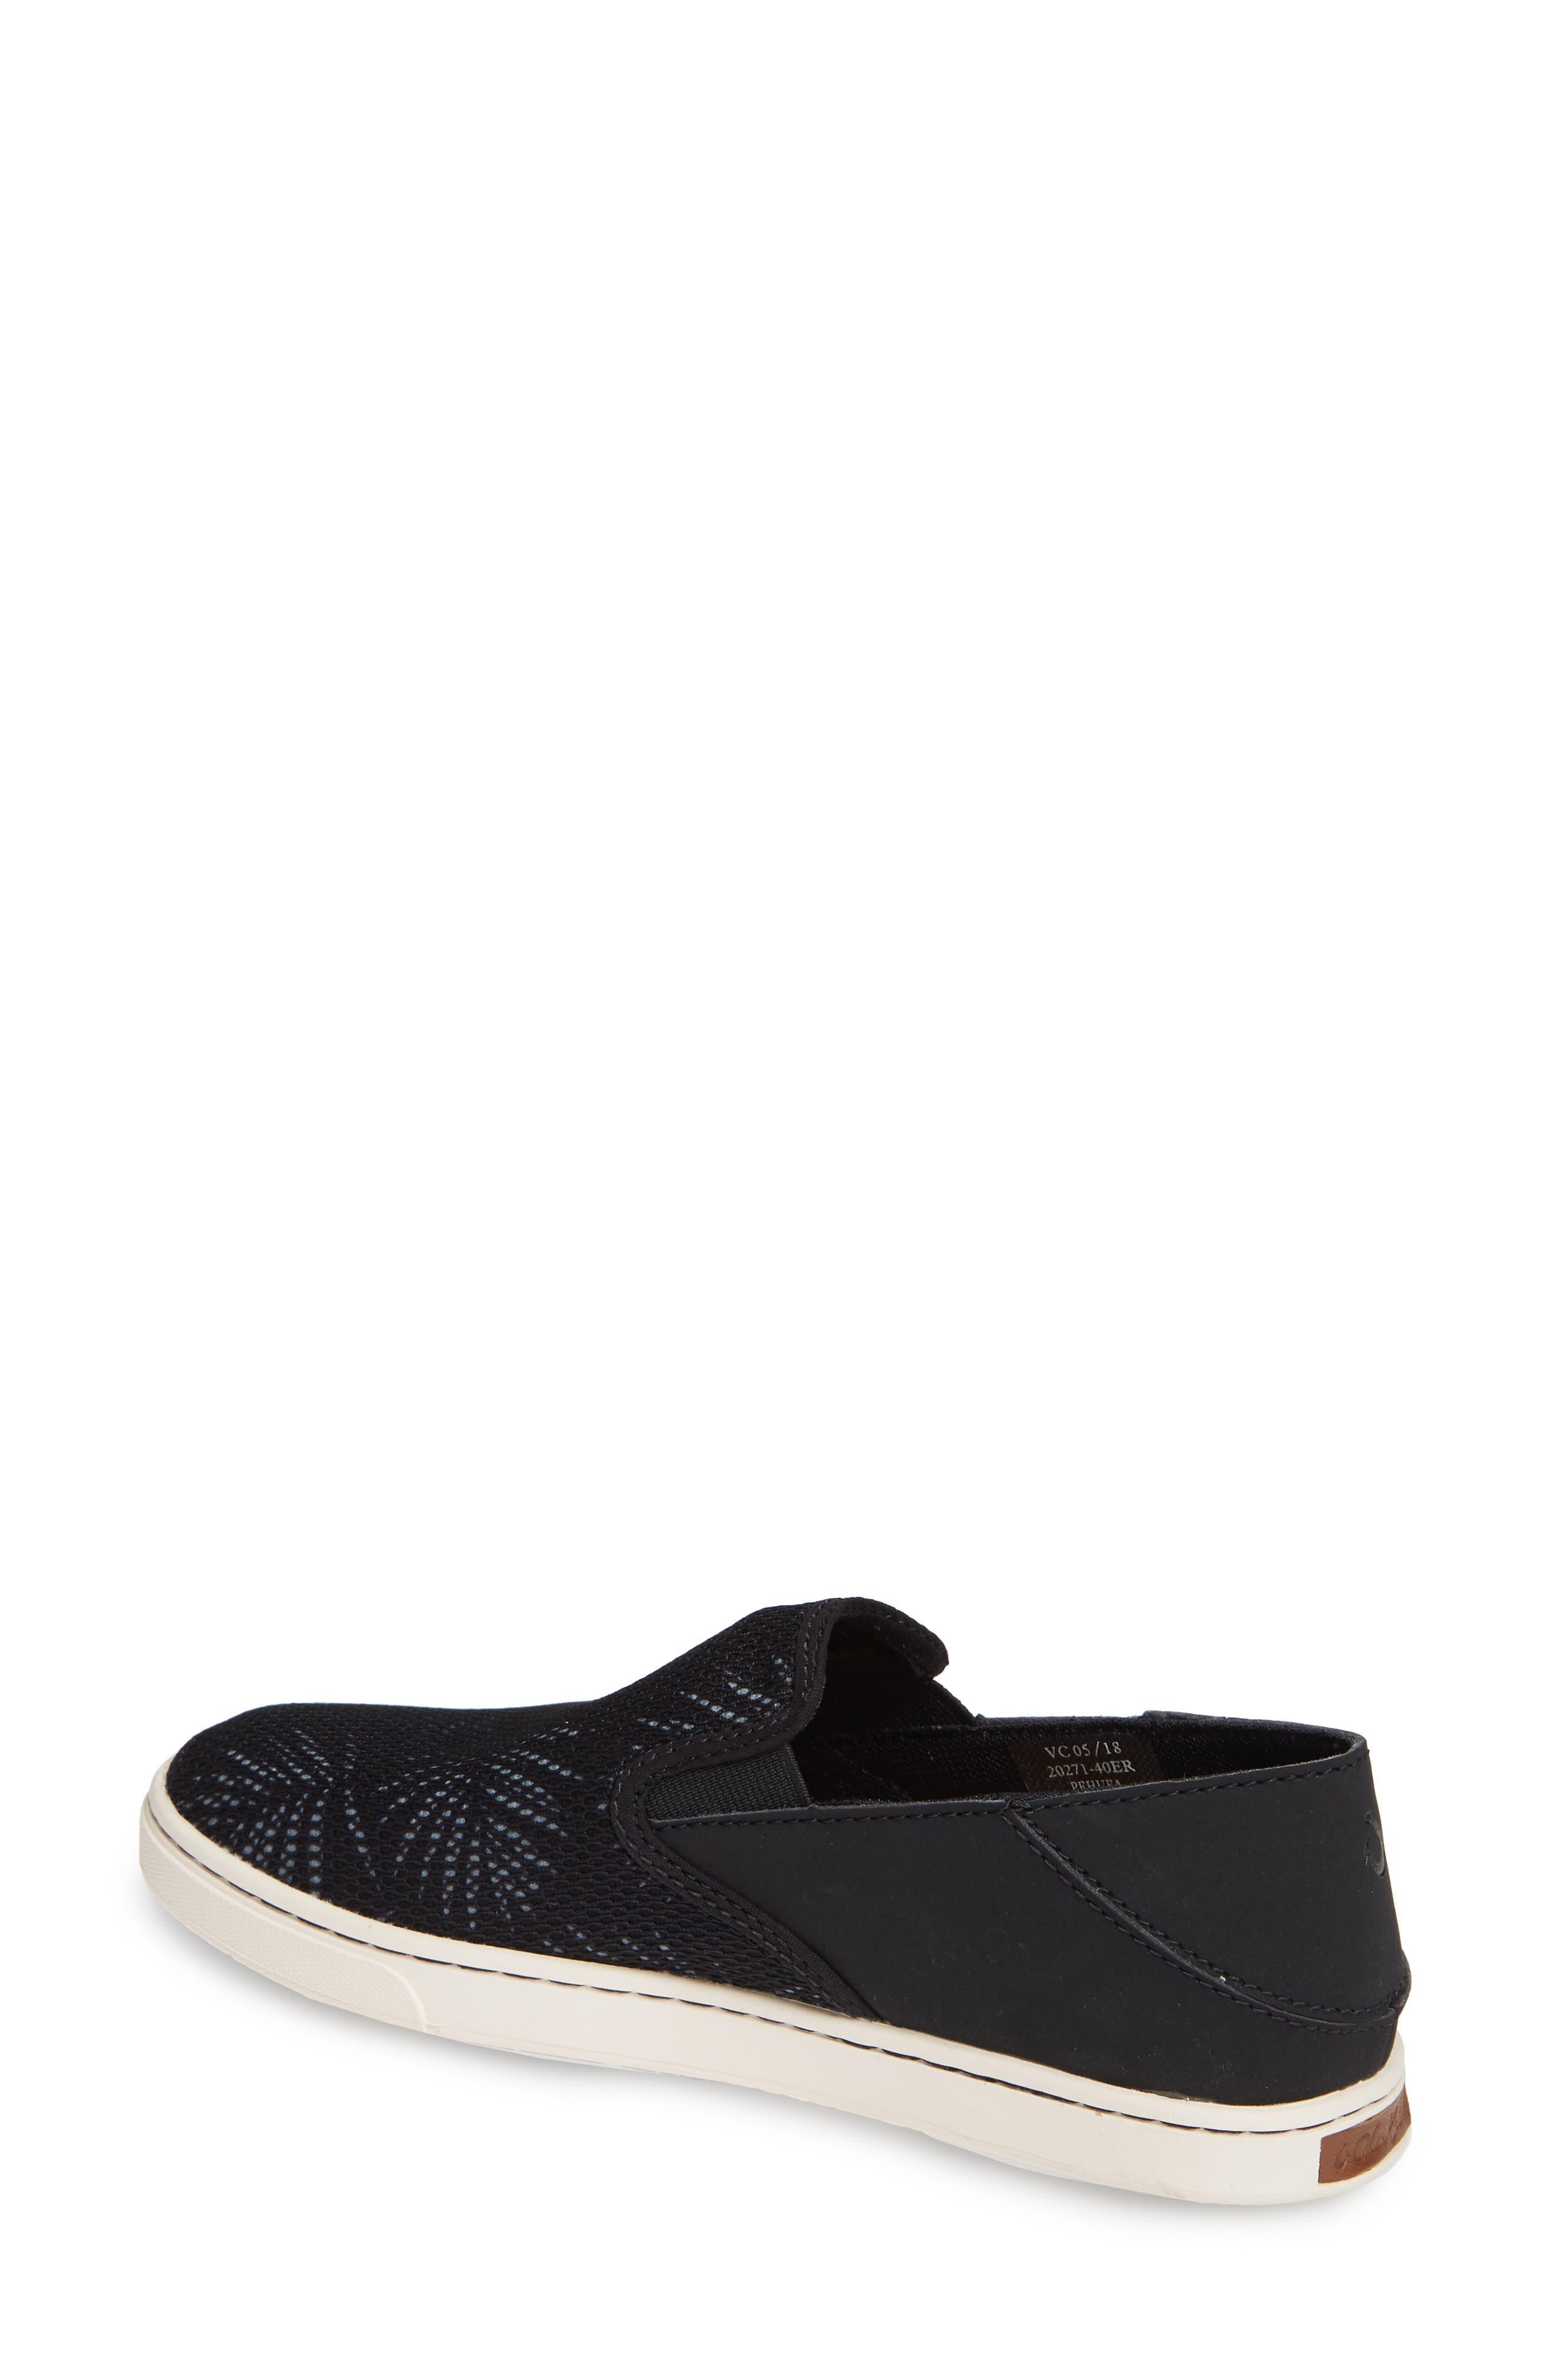 OLUKAI, 'Pehuea' Slip-On Sneaker, Alternate thumbnail 2, color, BLACK/ PALM FABRIC